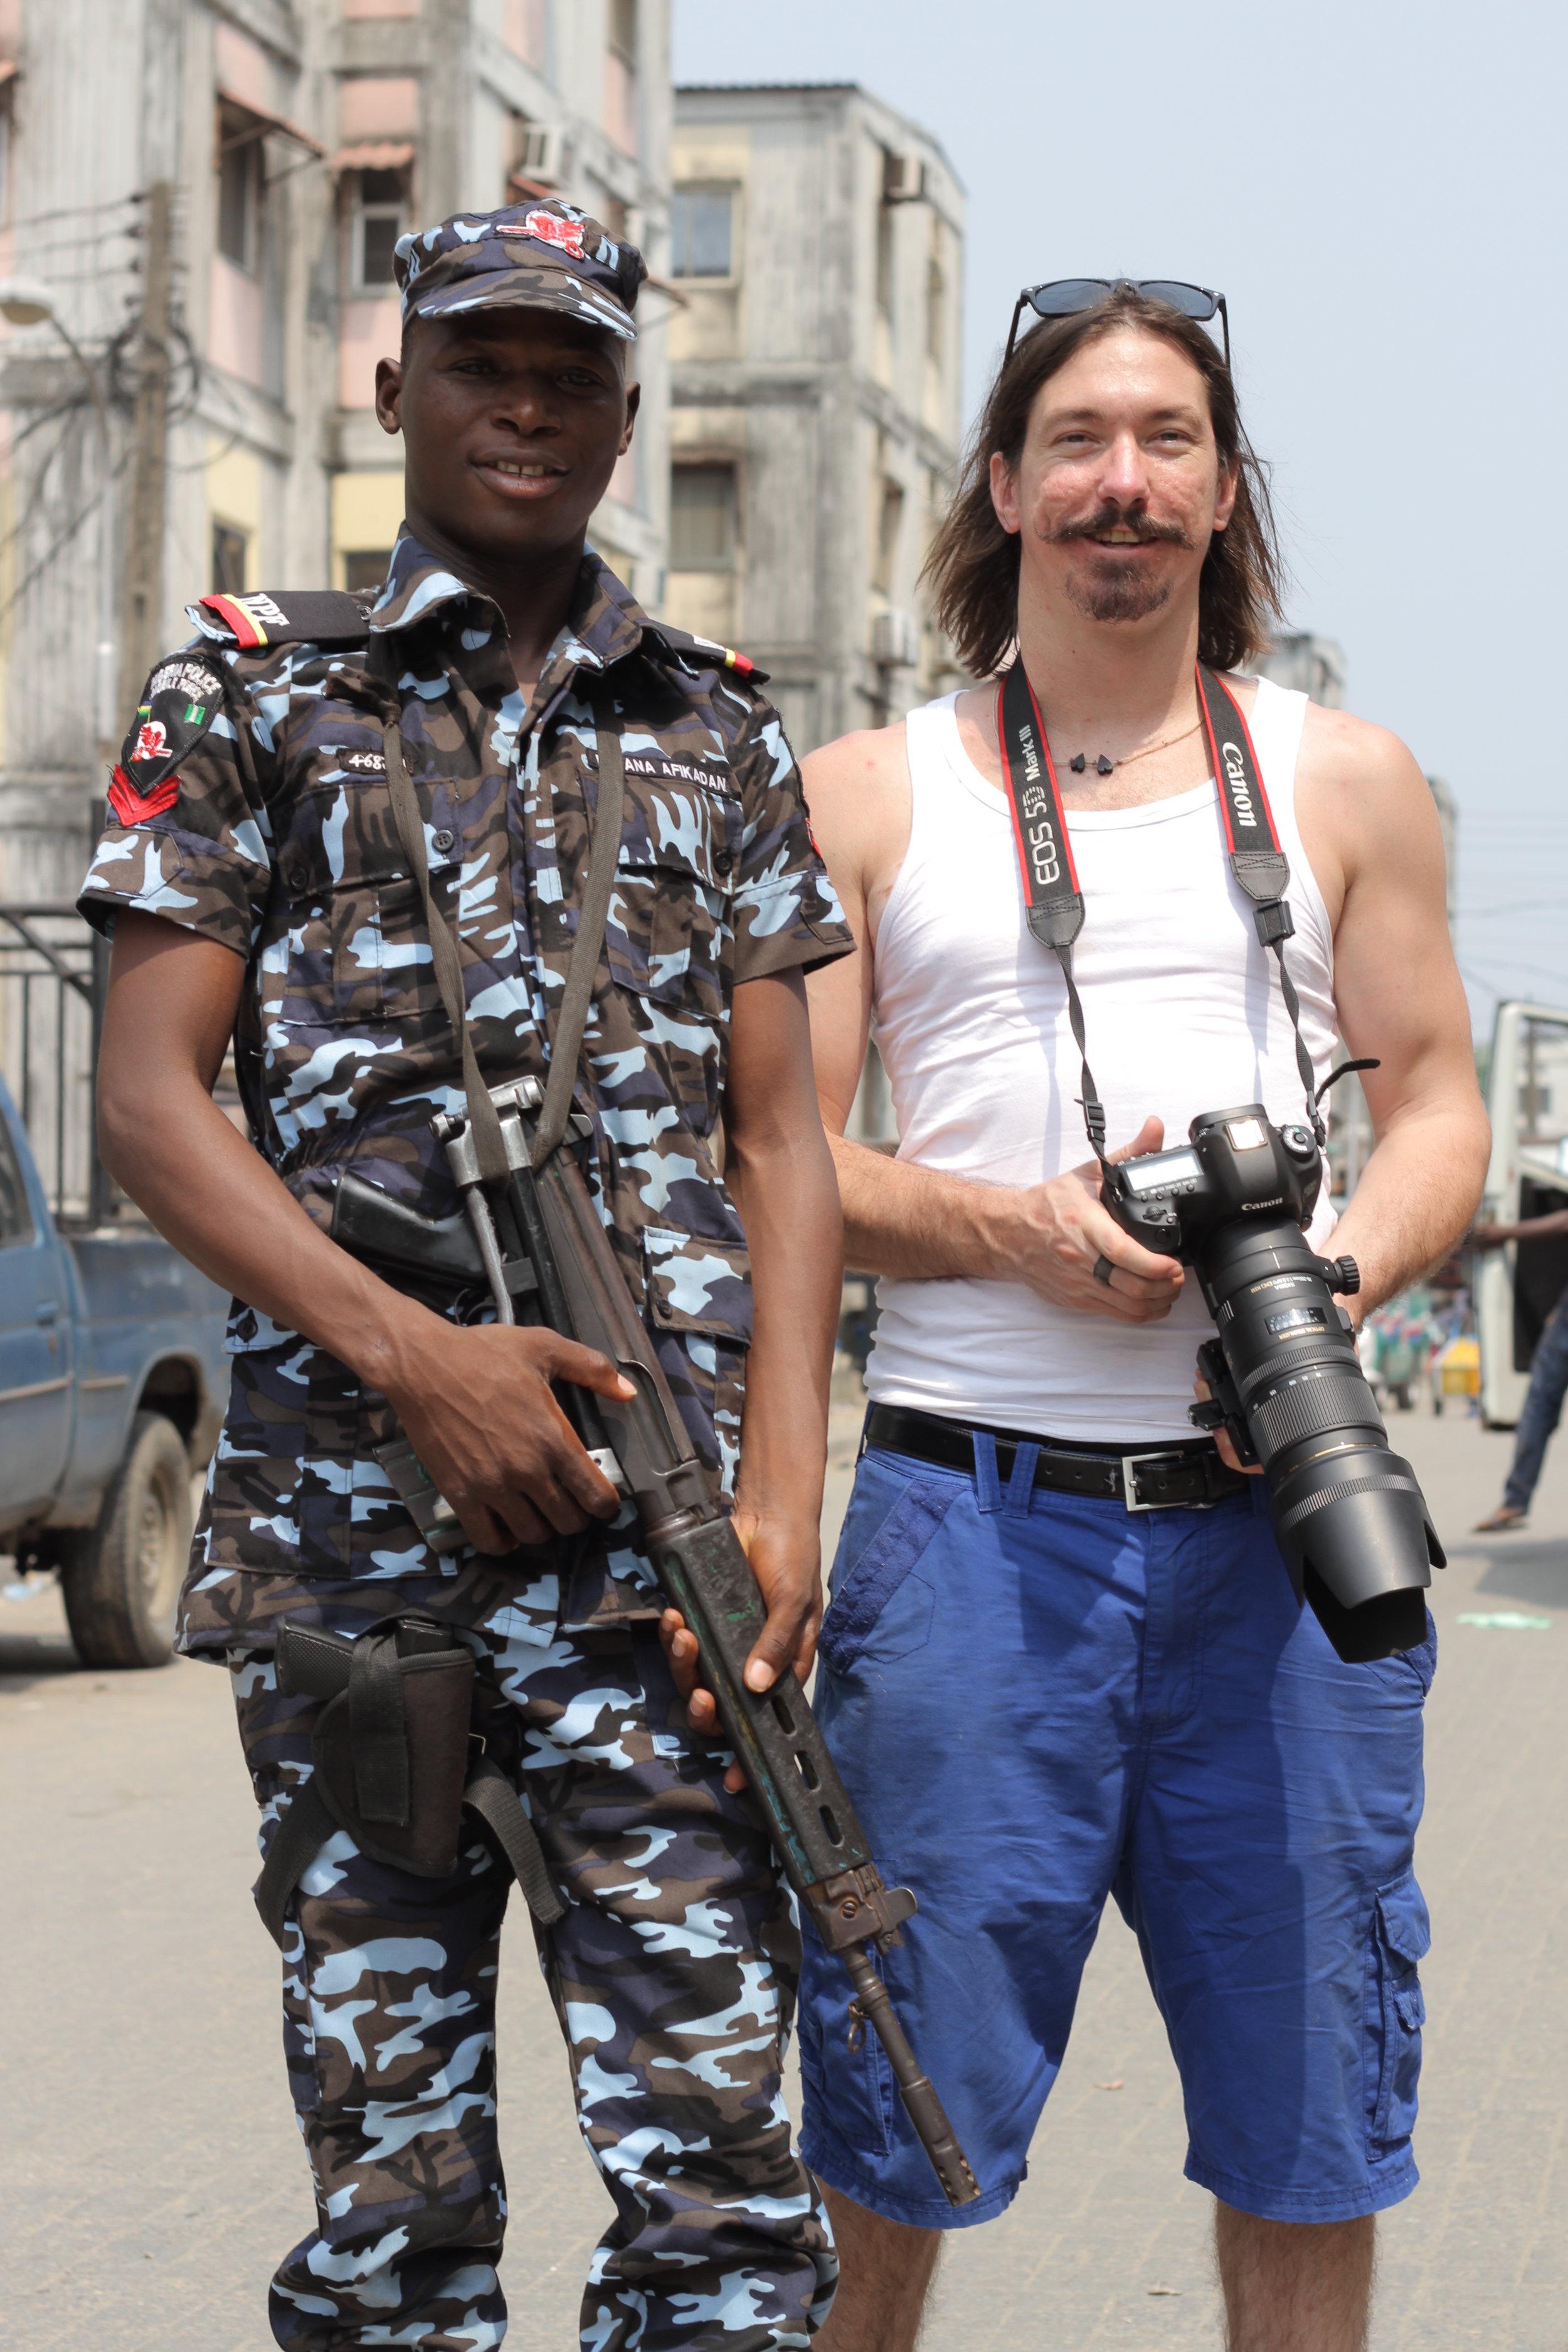 Mark with Elkana, our police escort